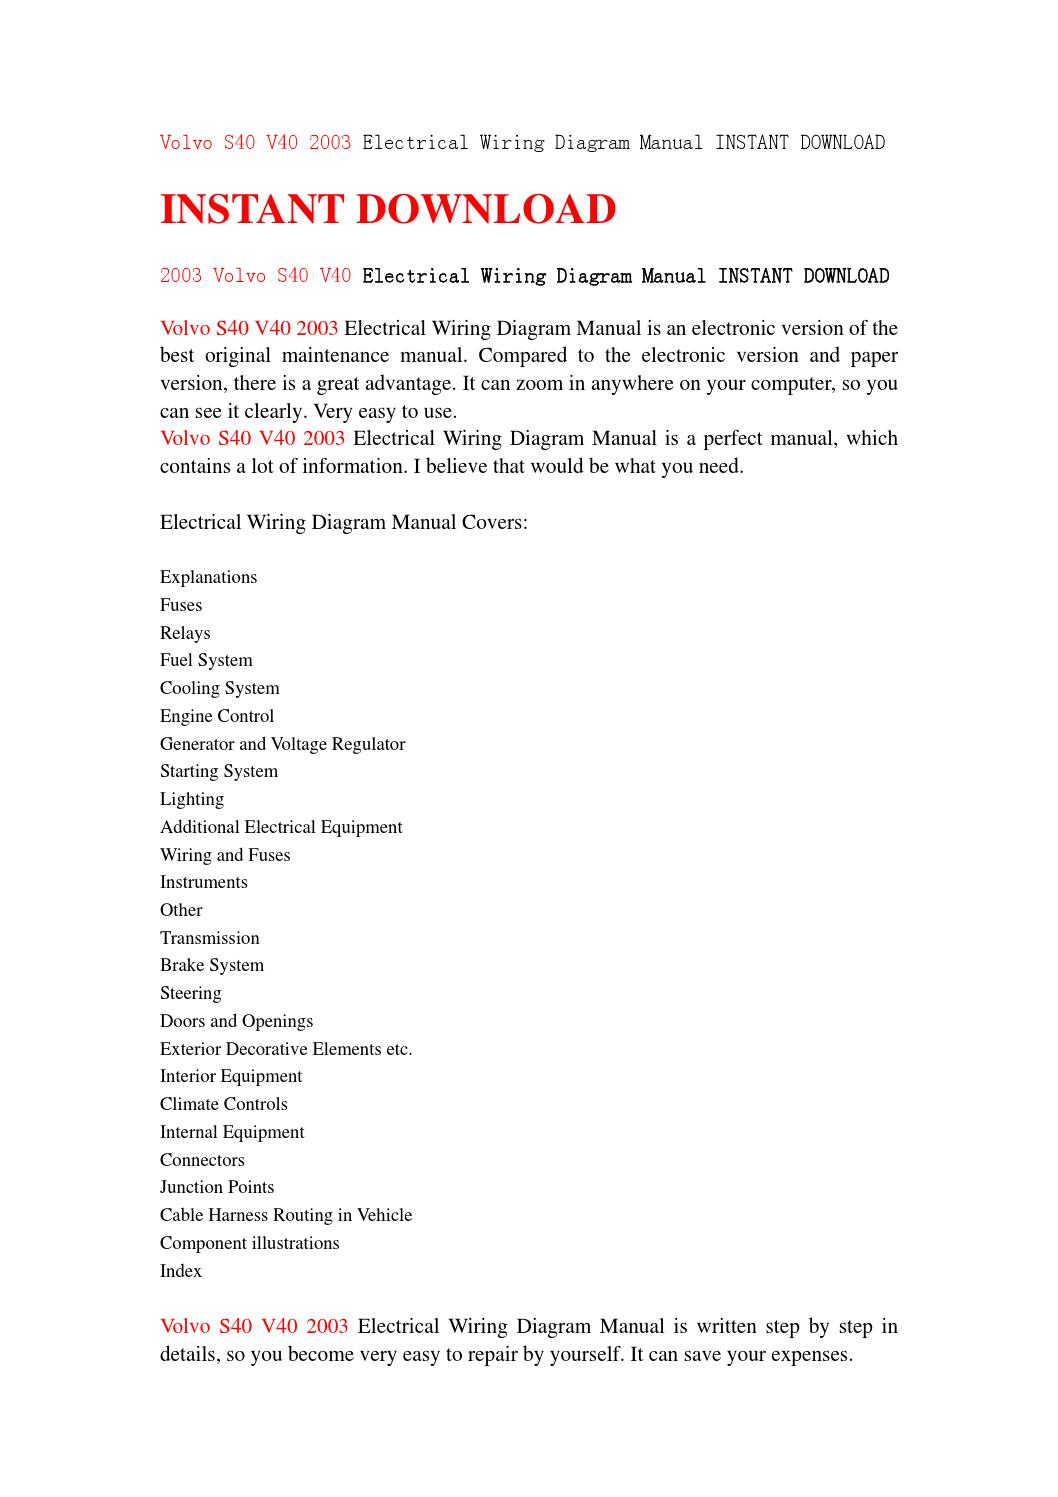 Volvo S40 V40 2003 Electrical Wiring Diagram Manual